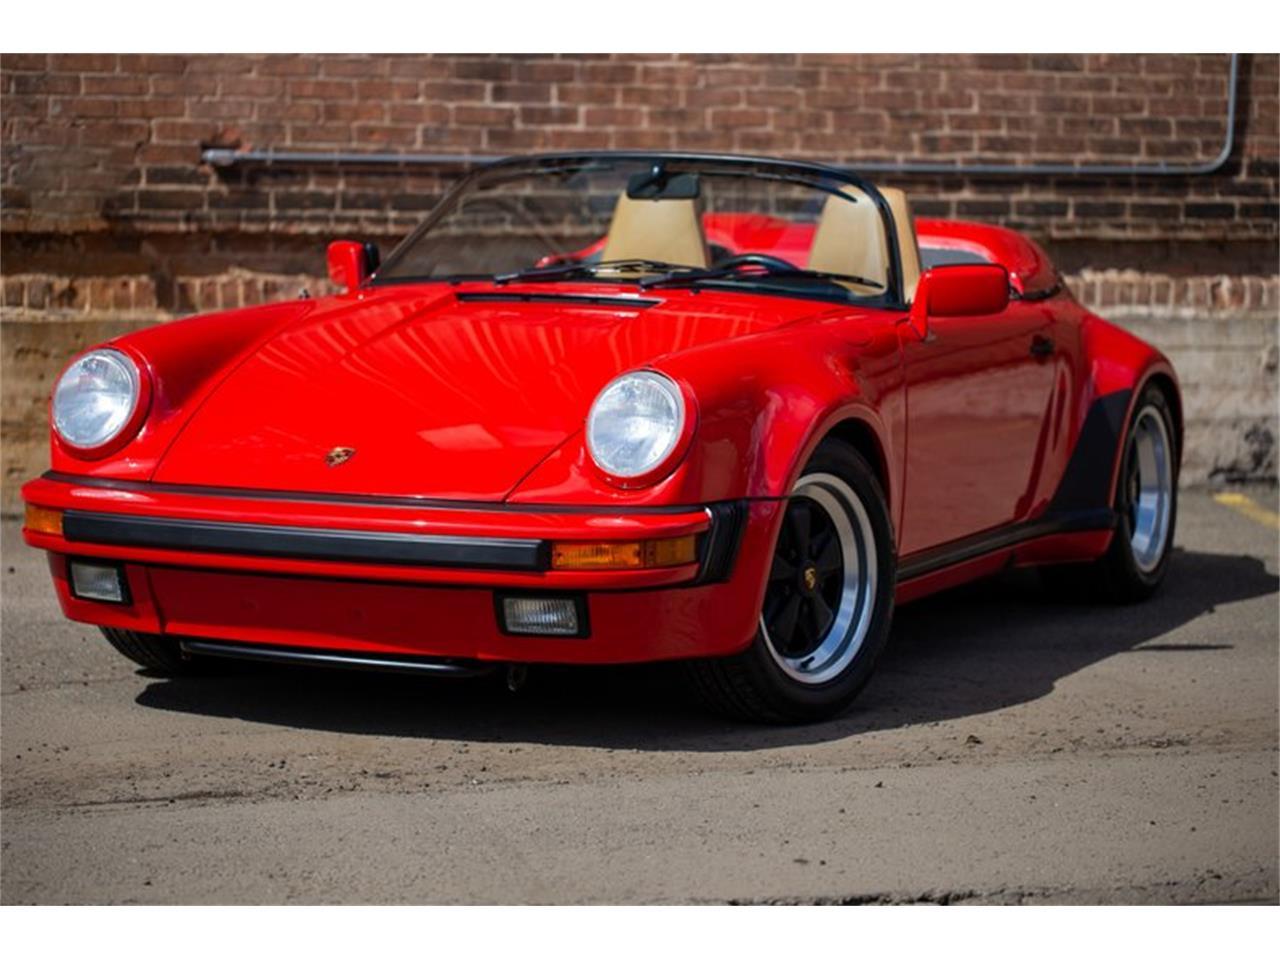 1989 Porsche 911 Speedster (CC-1201487) for sale in Wallingford, Connecticut